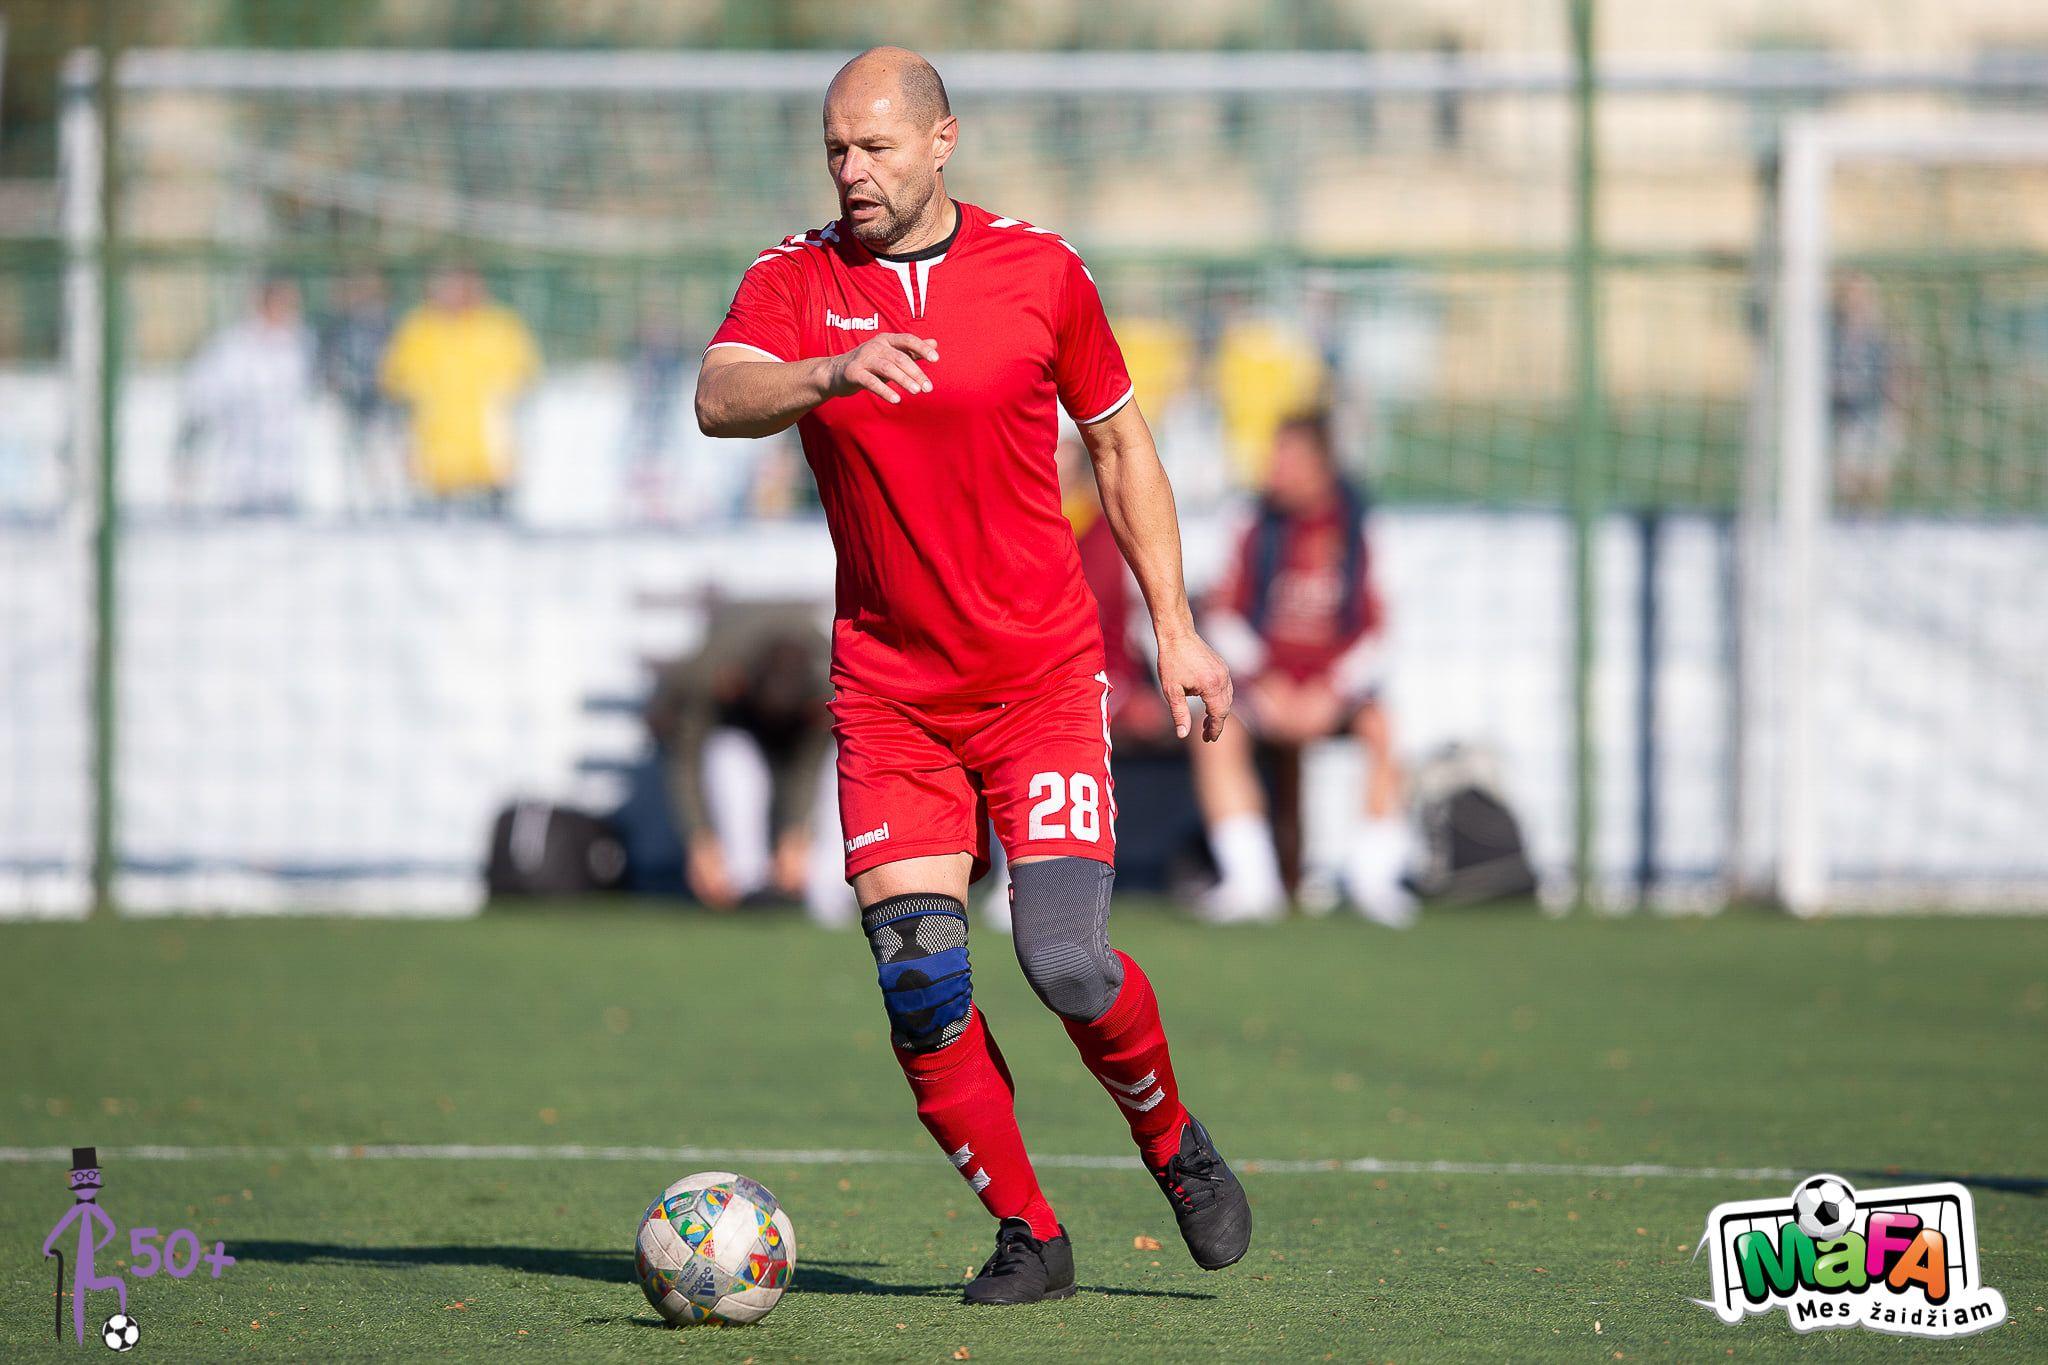 Lietuvos futbolo veteranų 50+ čempionatas